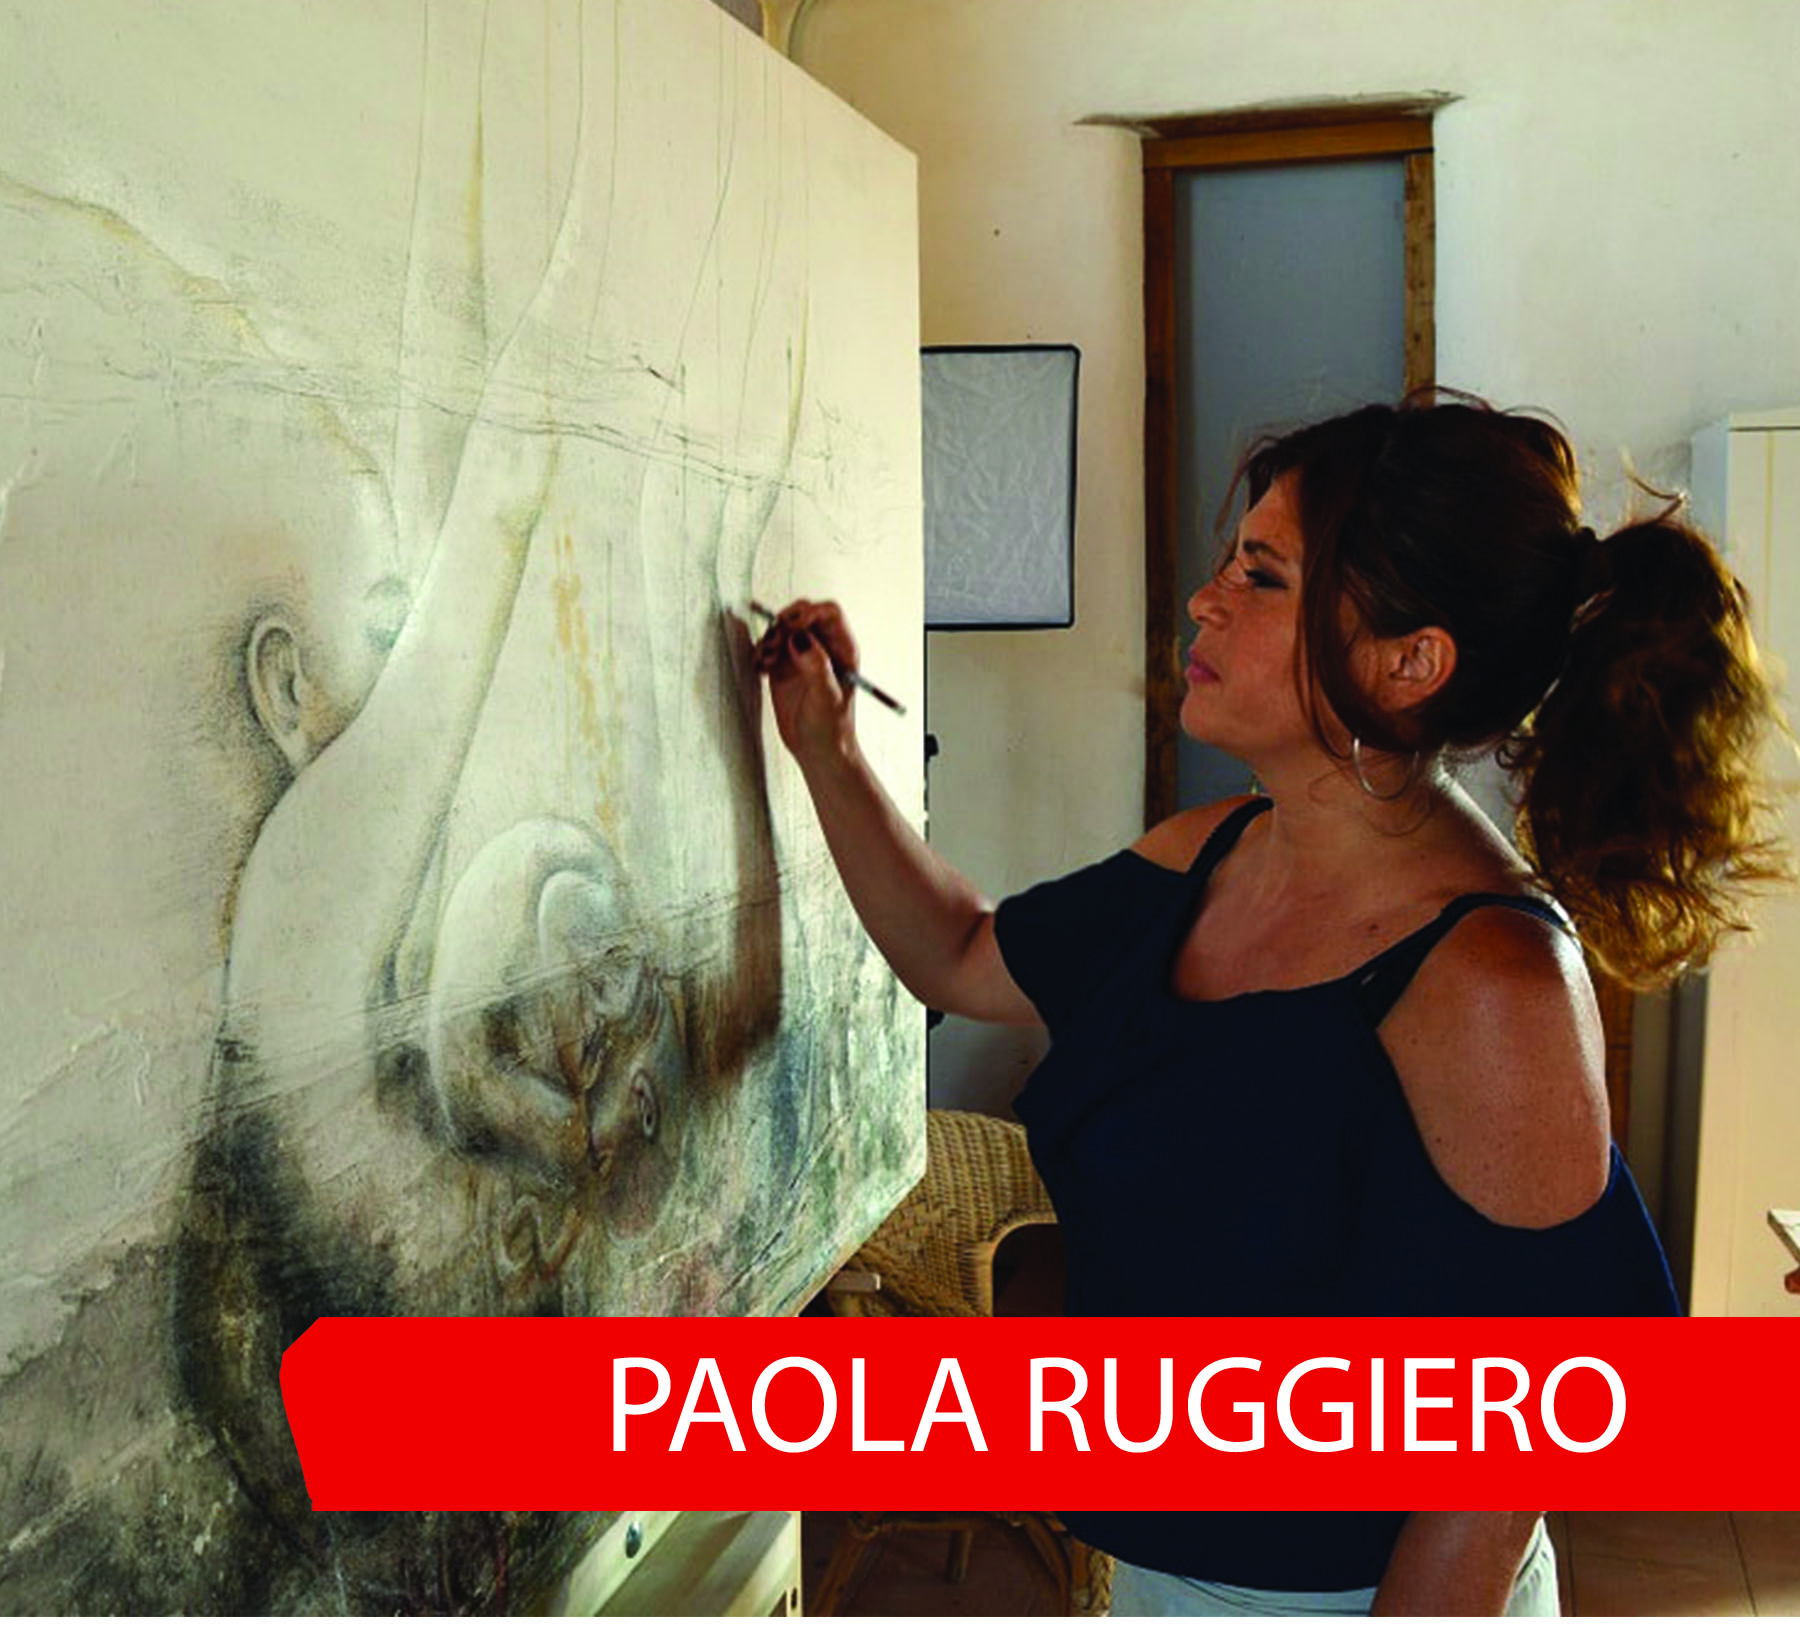 Paola Ruggiero